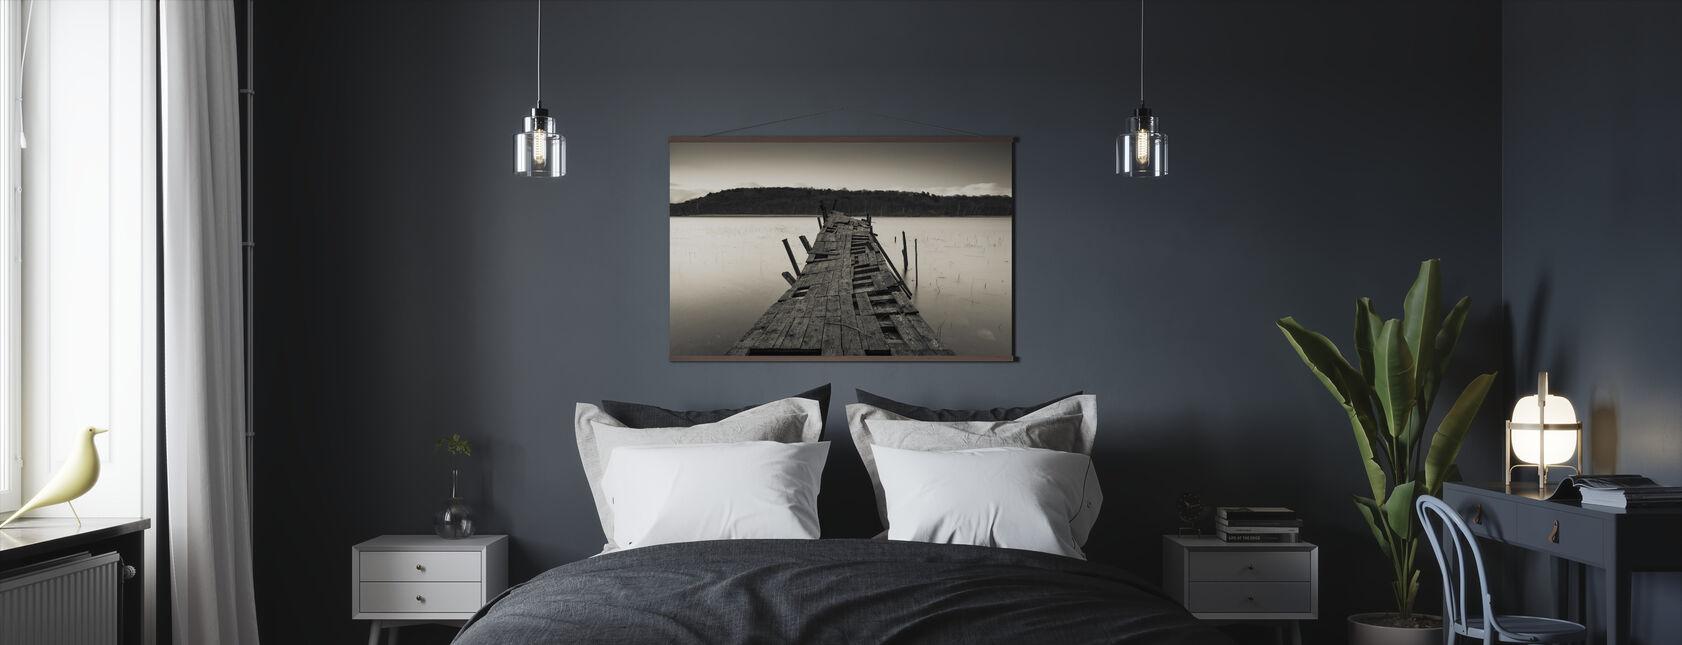 In Need of Maintenance - Poster - Bedroom